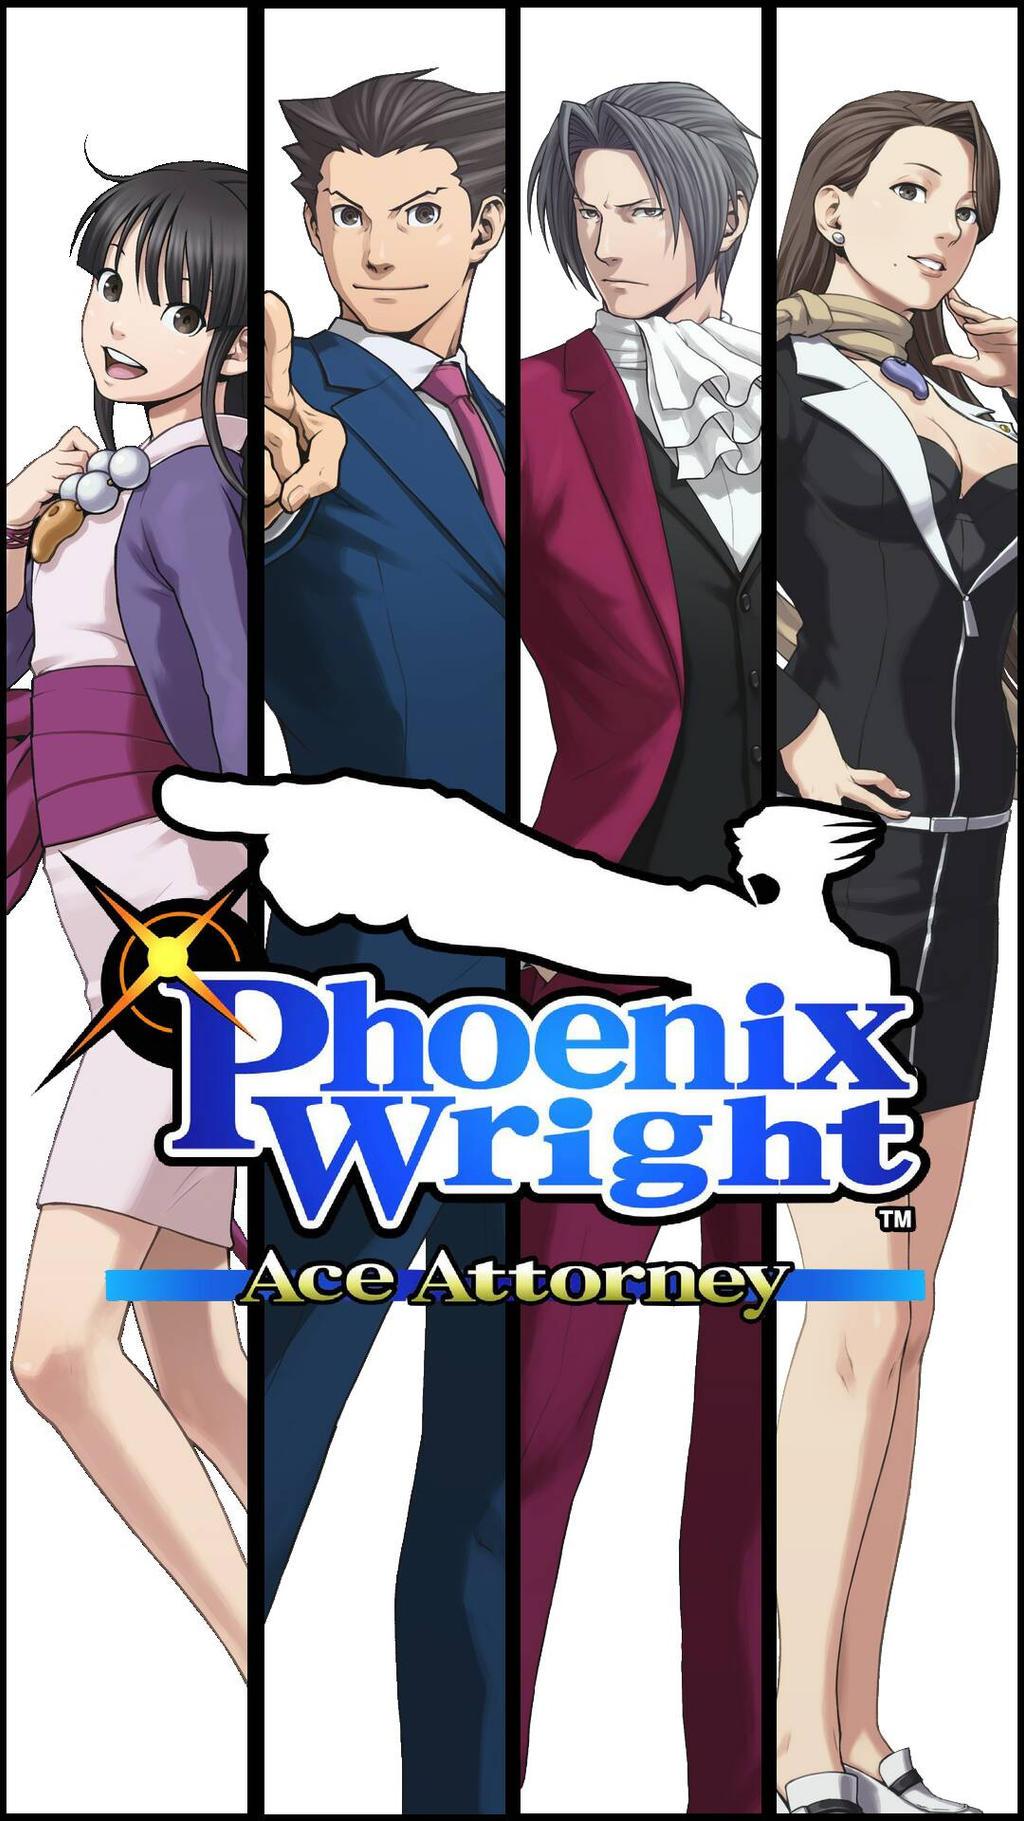 Phoenix Wright Ace Attorney Wallpaper By Gmivan On Deviantart